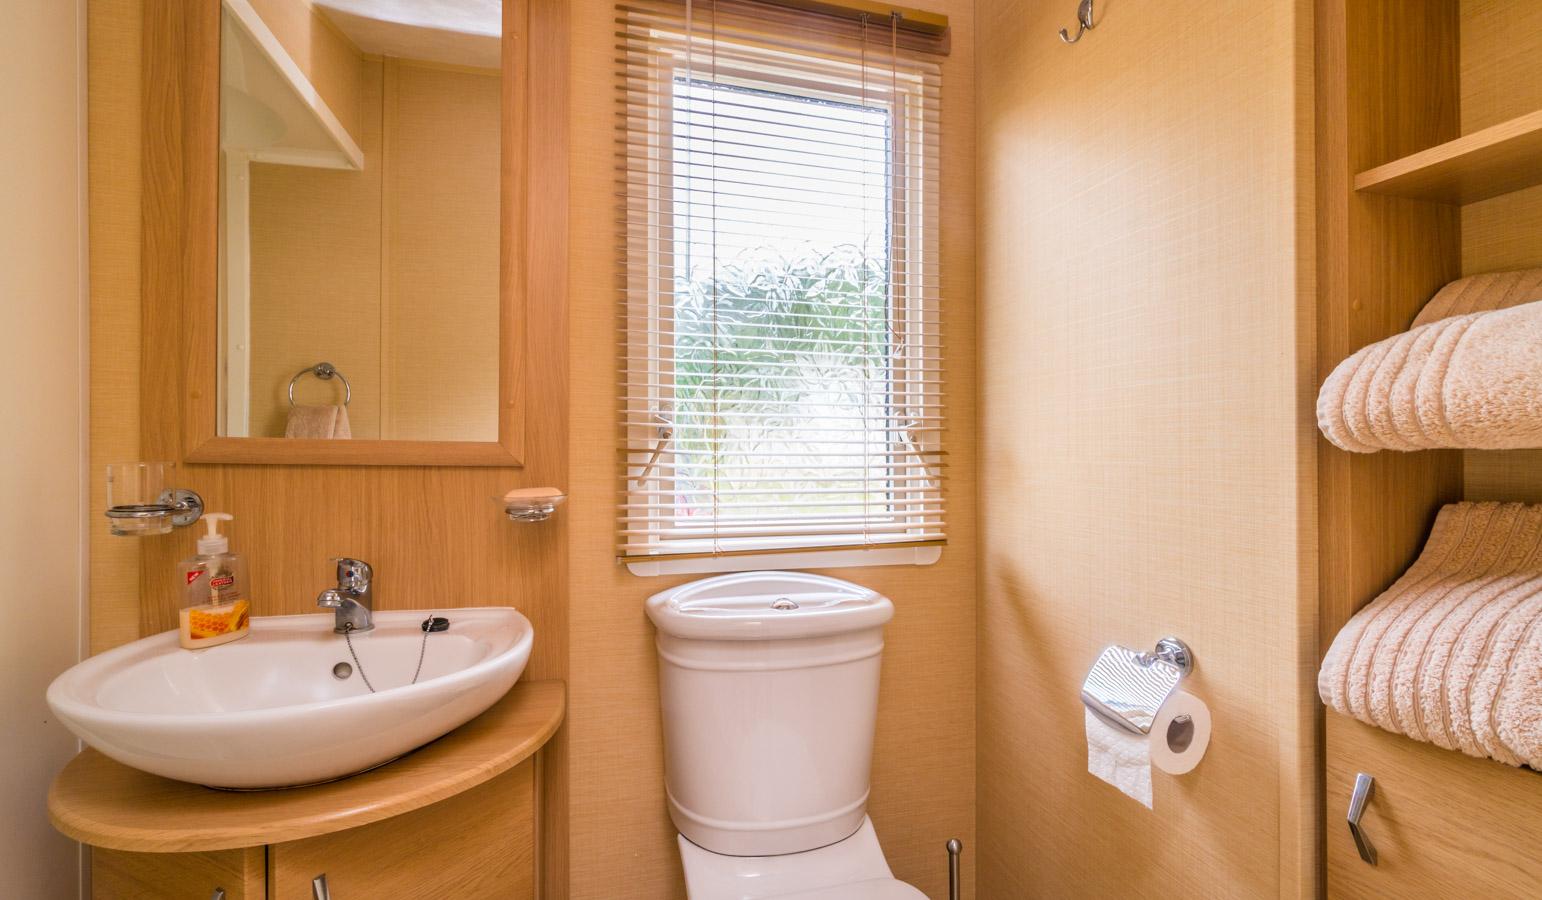 Neil-Bigwood-Monkton-Wyld-Holiday-Homes-34